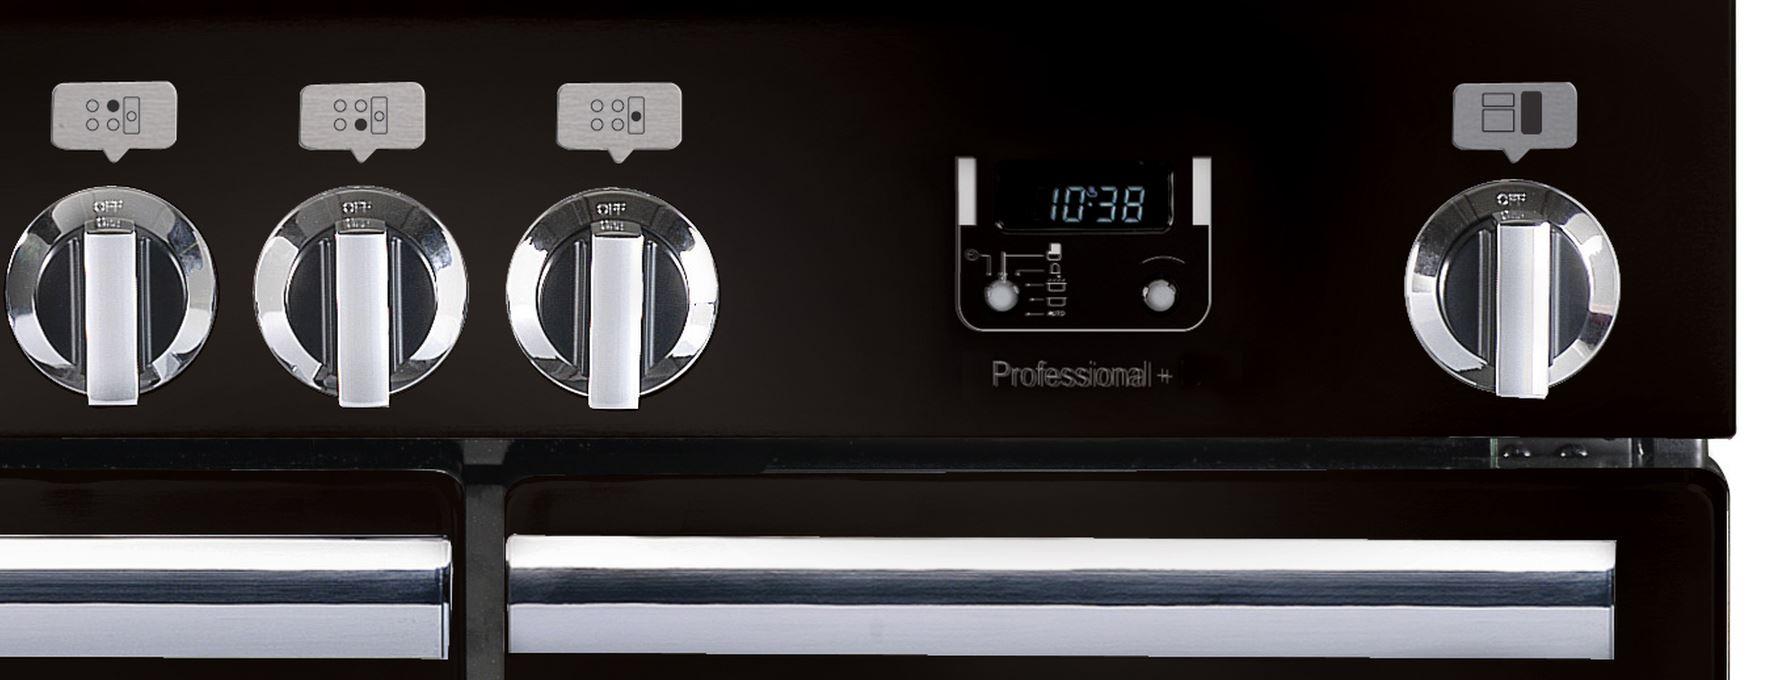 informationsseite h ttich falcon professional 90 range cooker elektroherd mit. Black Bedroom Furniture Sets. Home Design Ideas